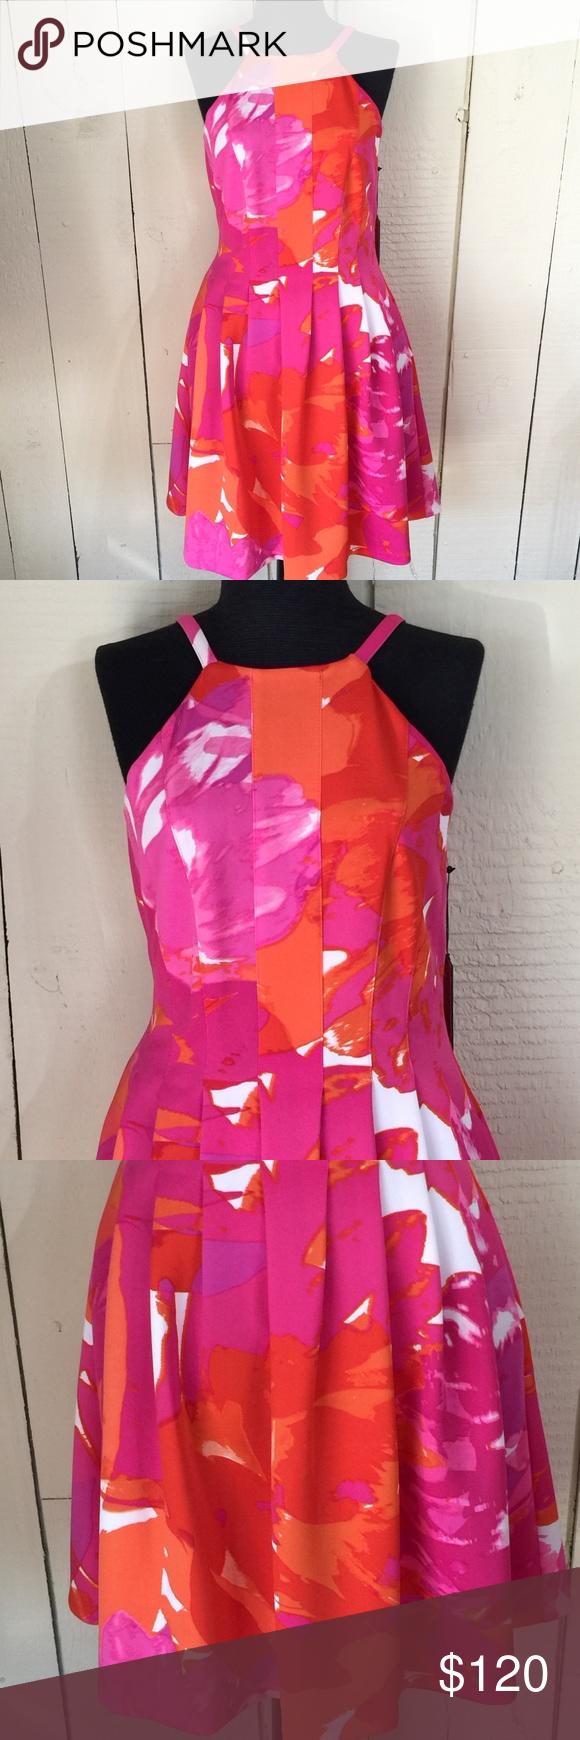 Bnwt Vince Camuto Pleated Floral Gorgeous Dresses Clothes Design Floral Halter Top [ 1740 x 580 Pixel ]